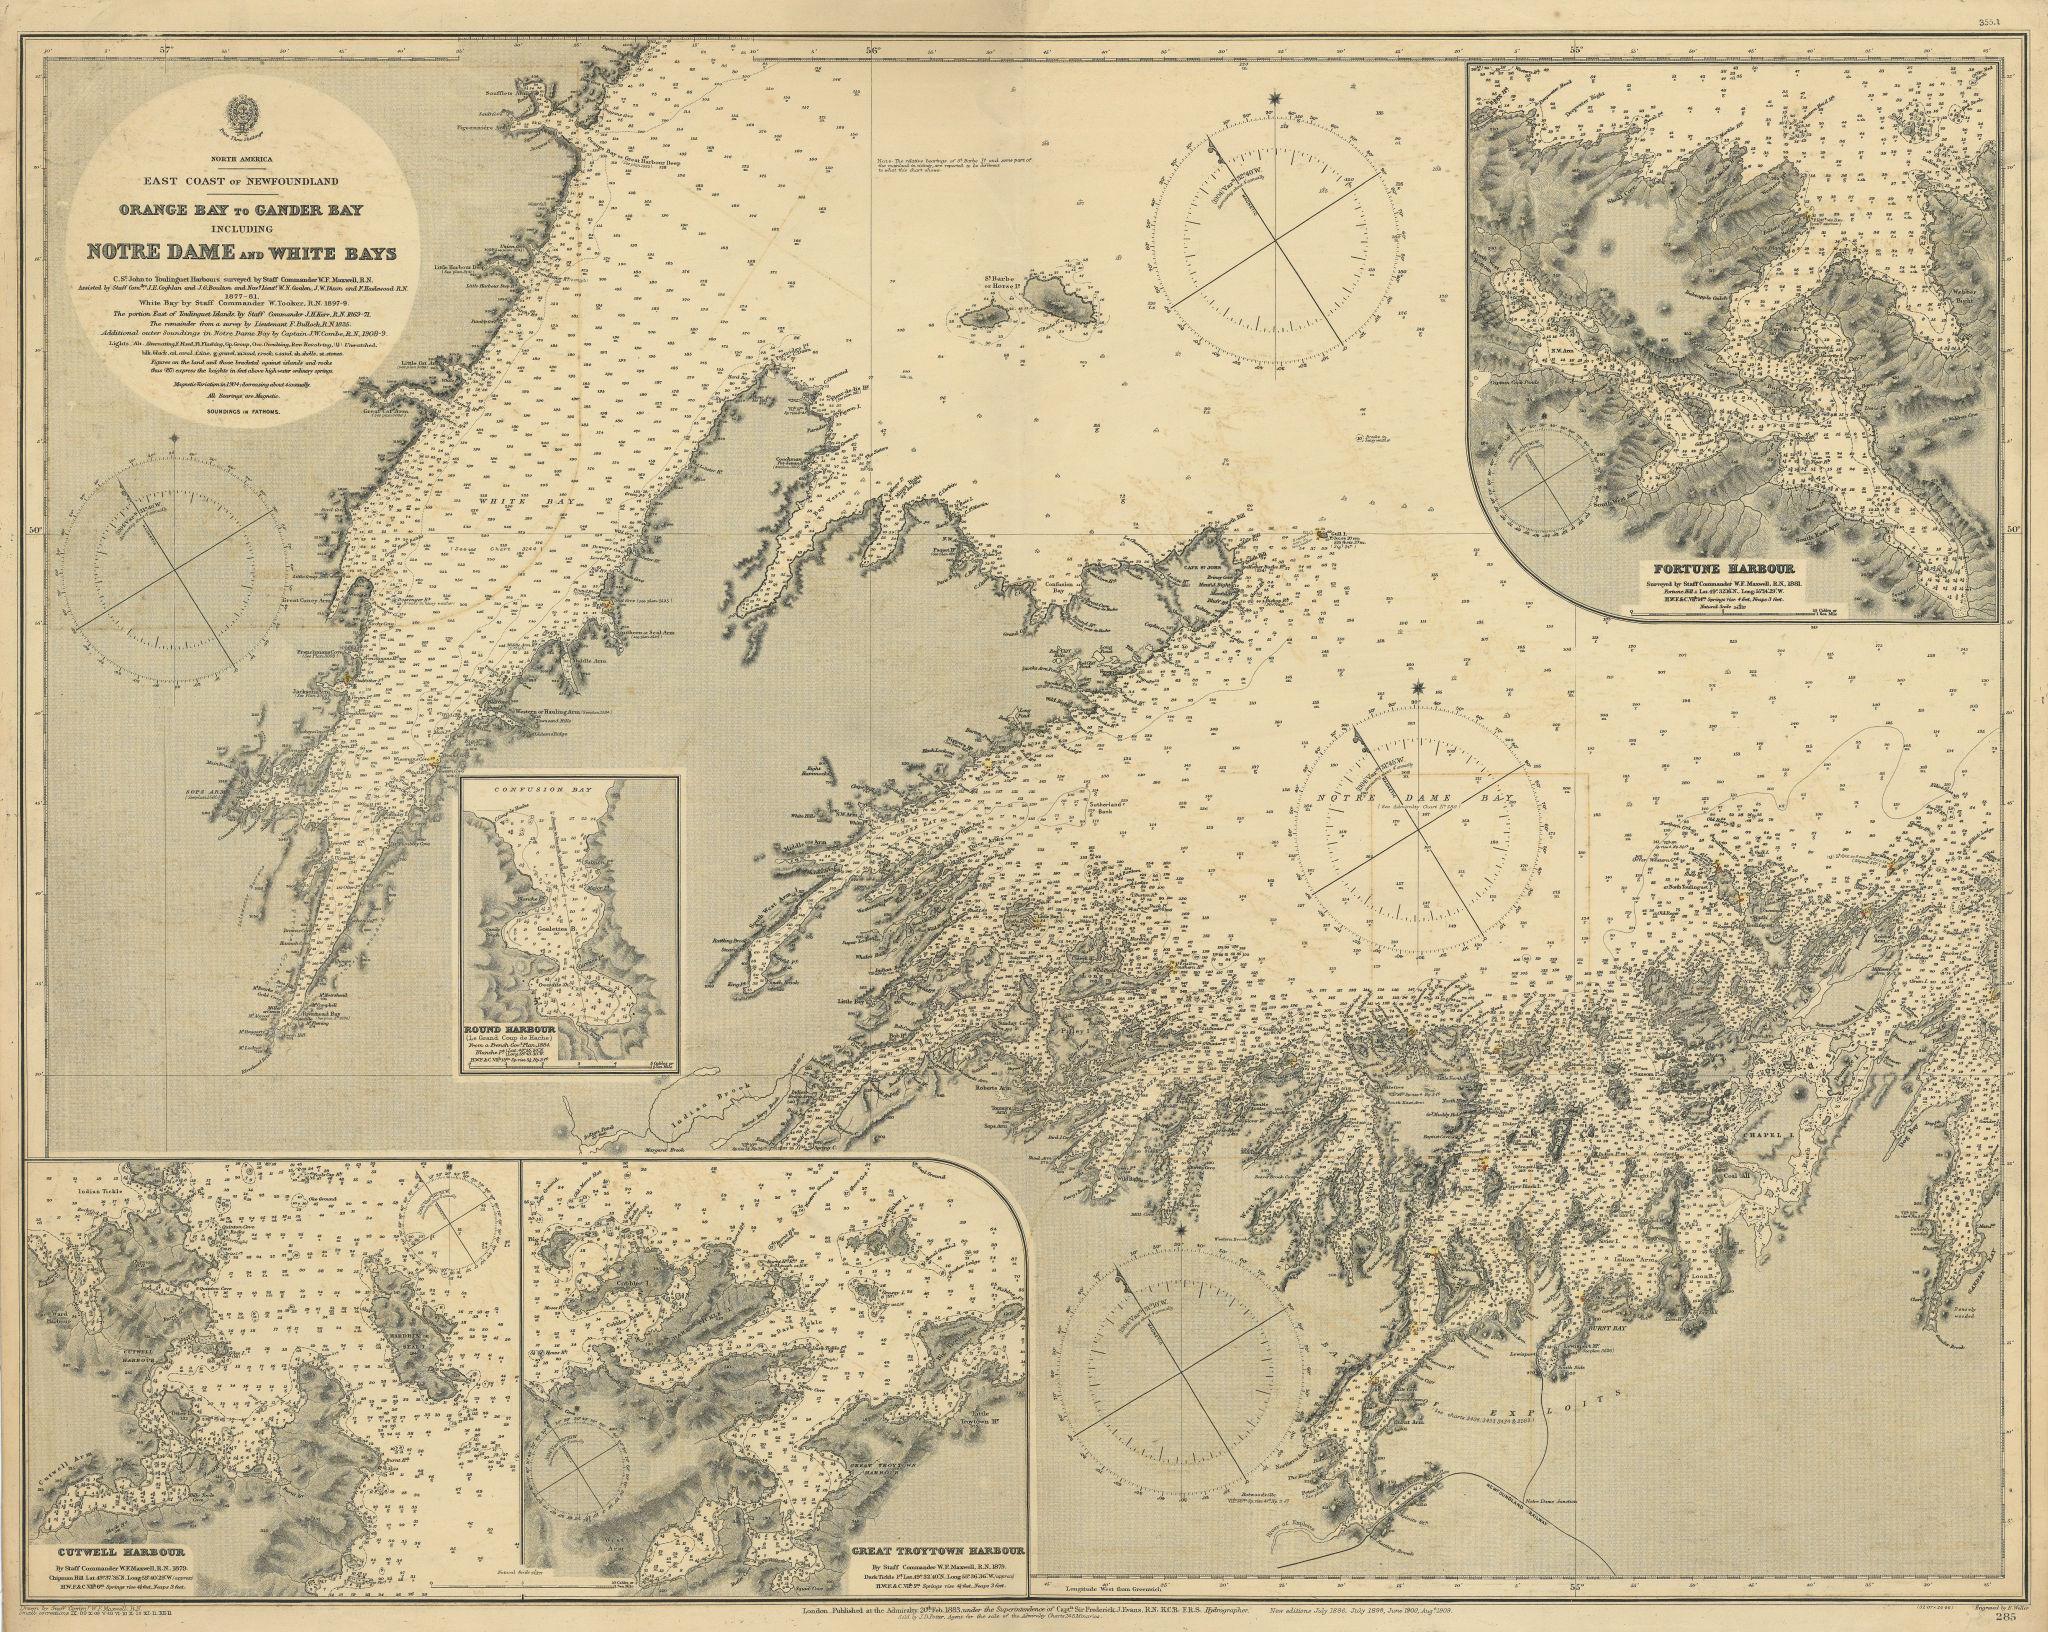 Newfoundland coast. Orange Bay-Gander Bay. ADMIRALTY sea chart 1883 (1911) map